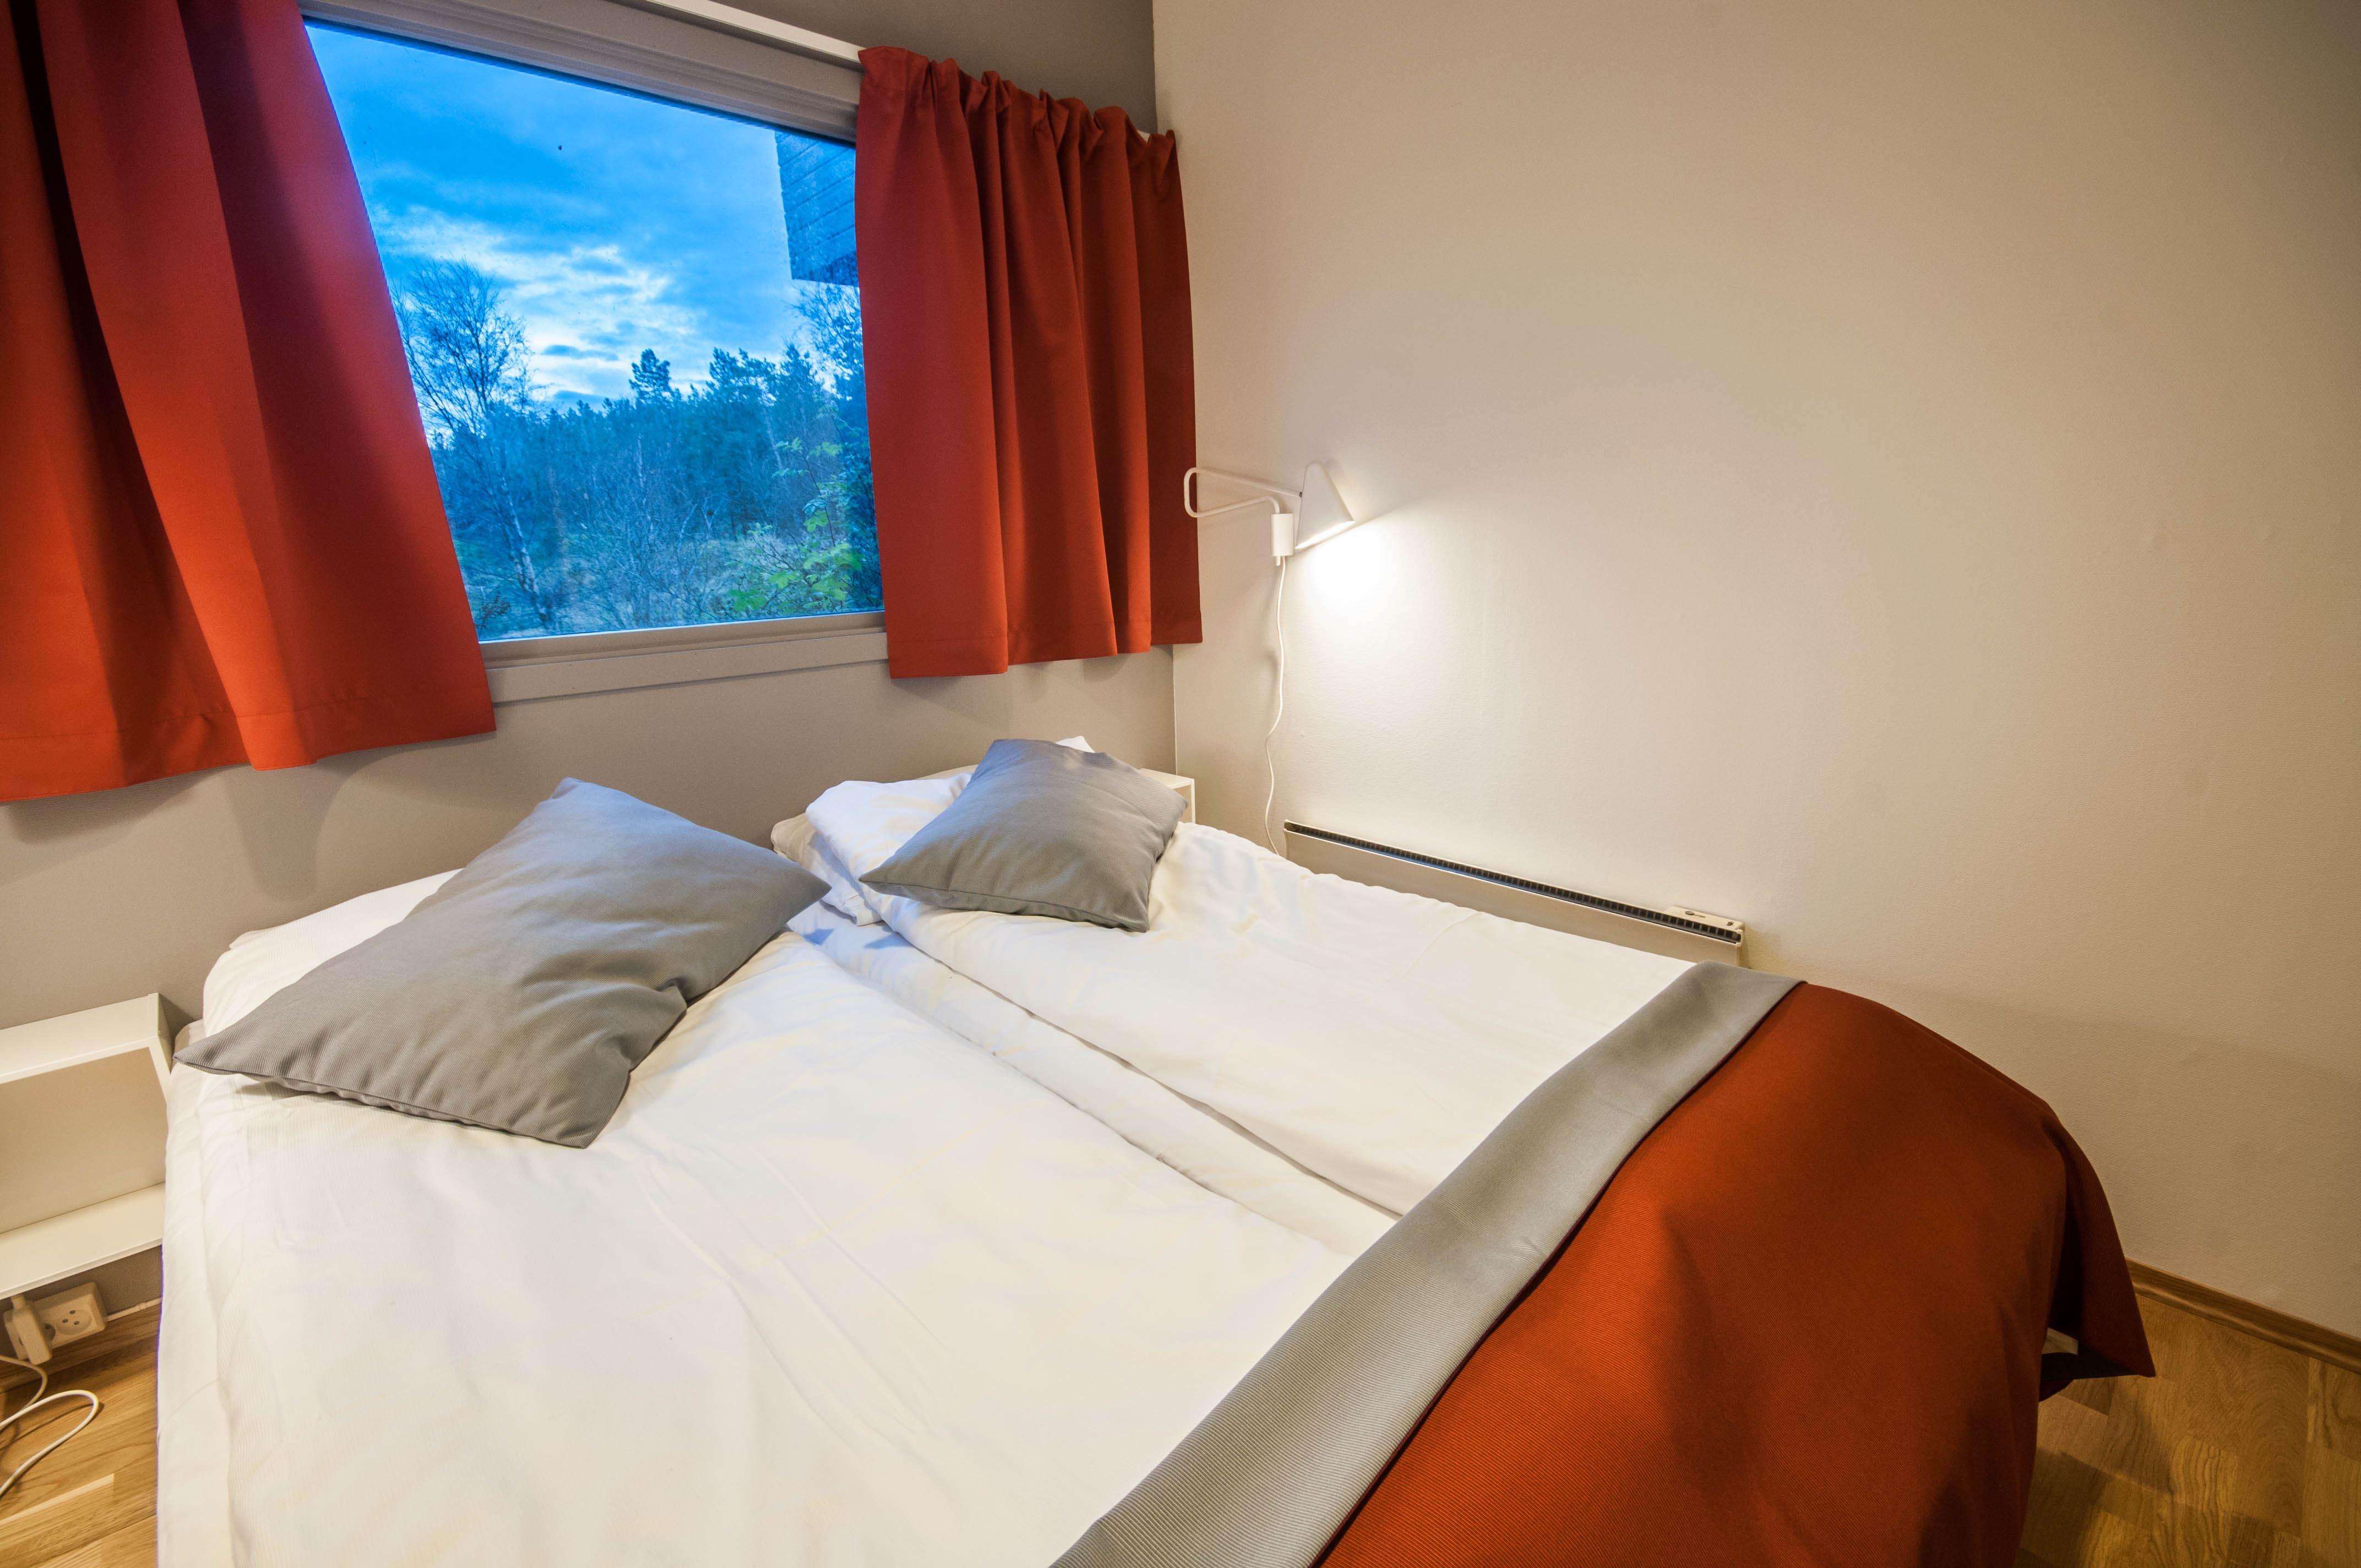 Dolmsundet Hotel, apartments